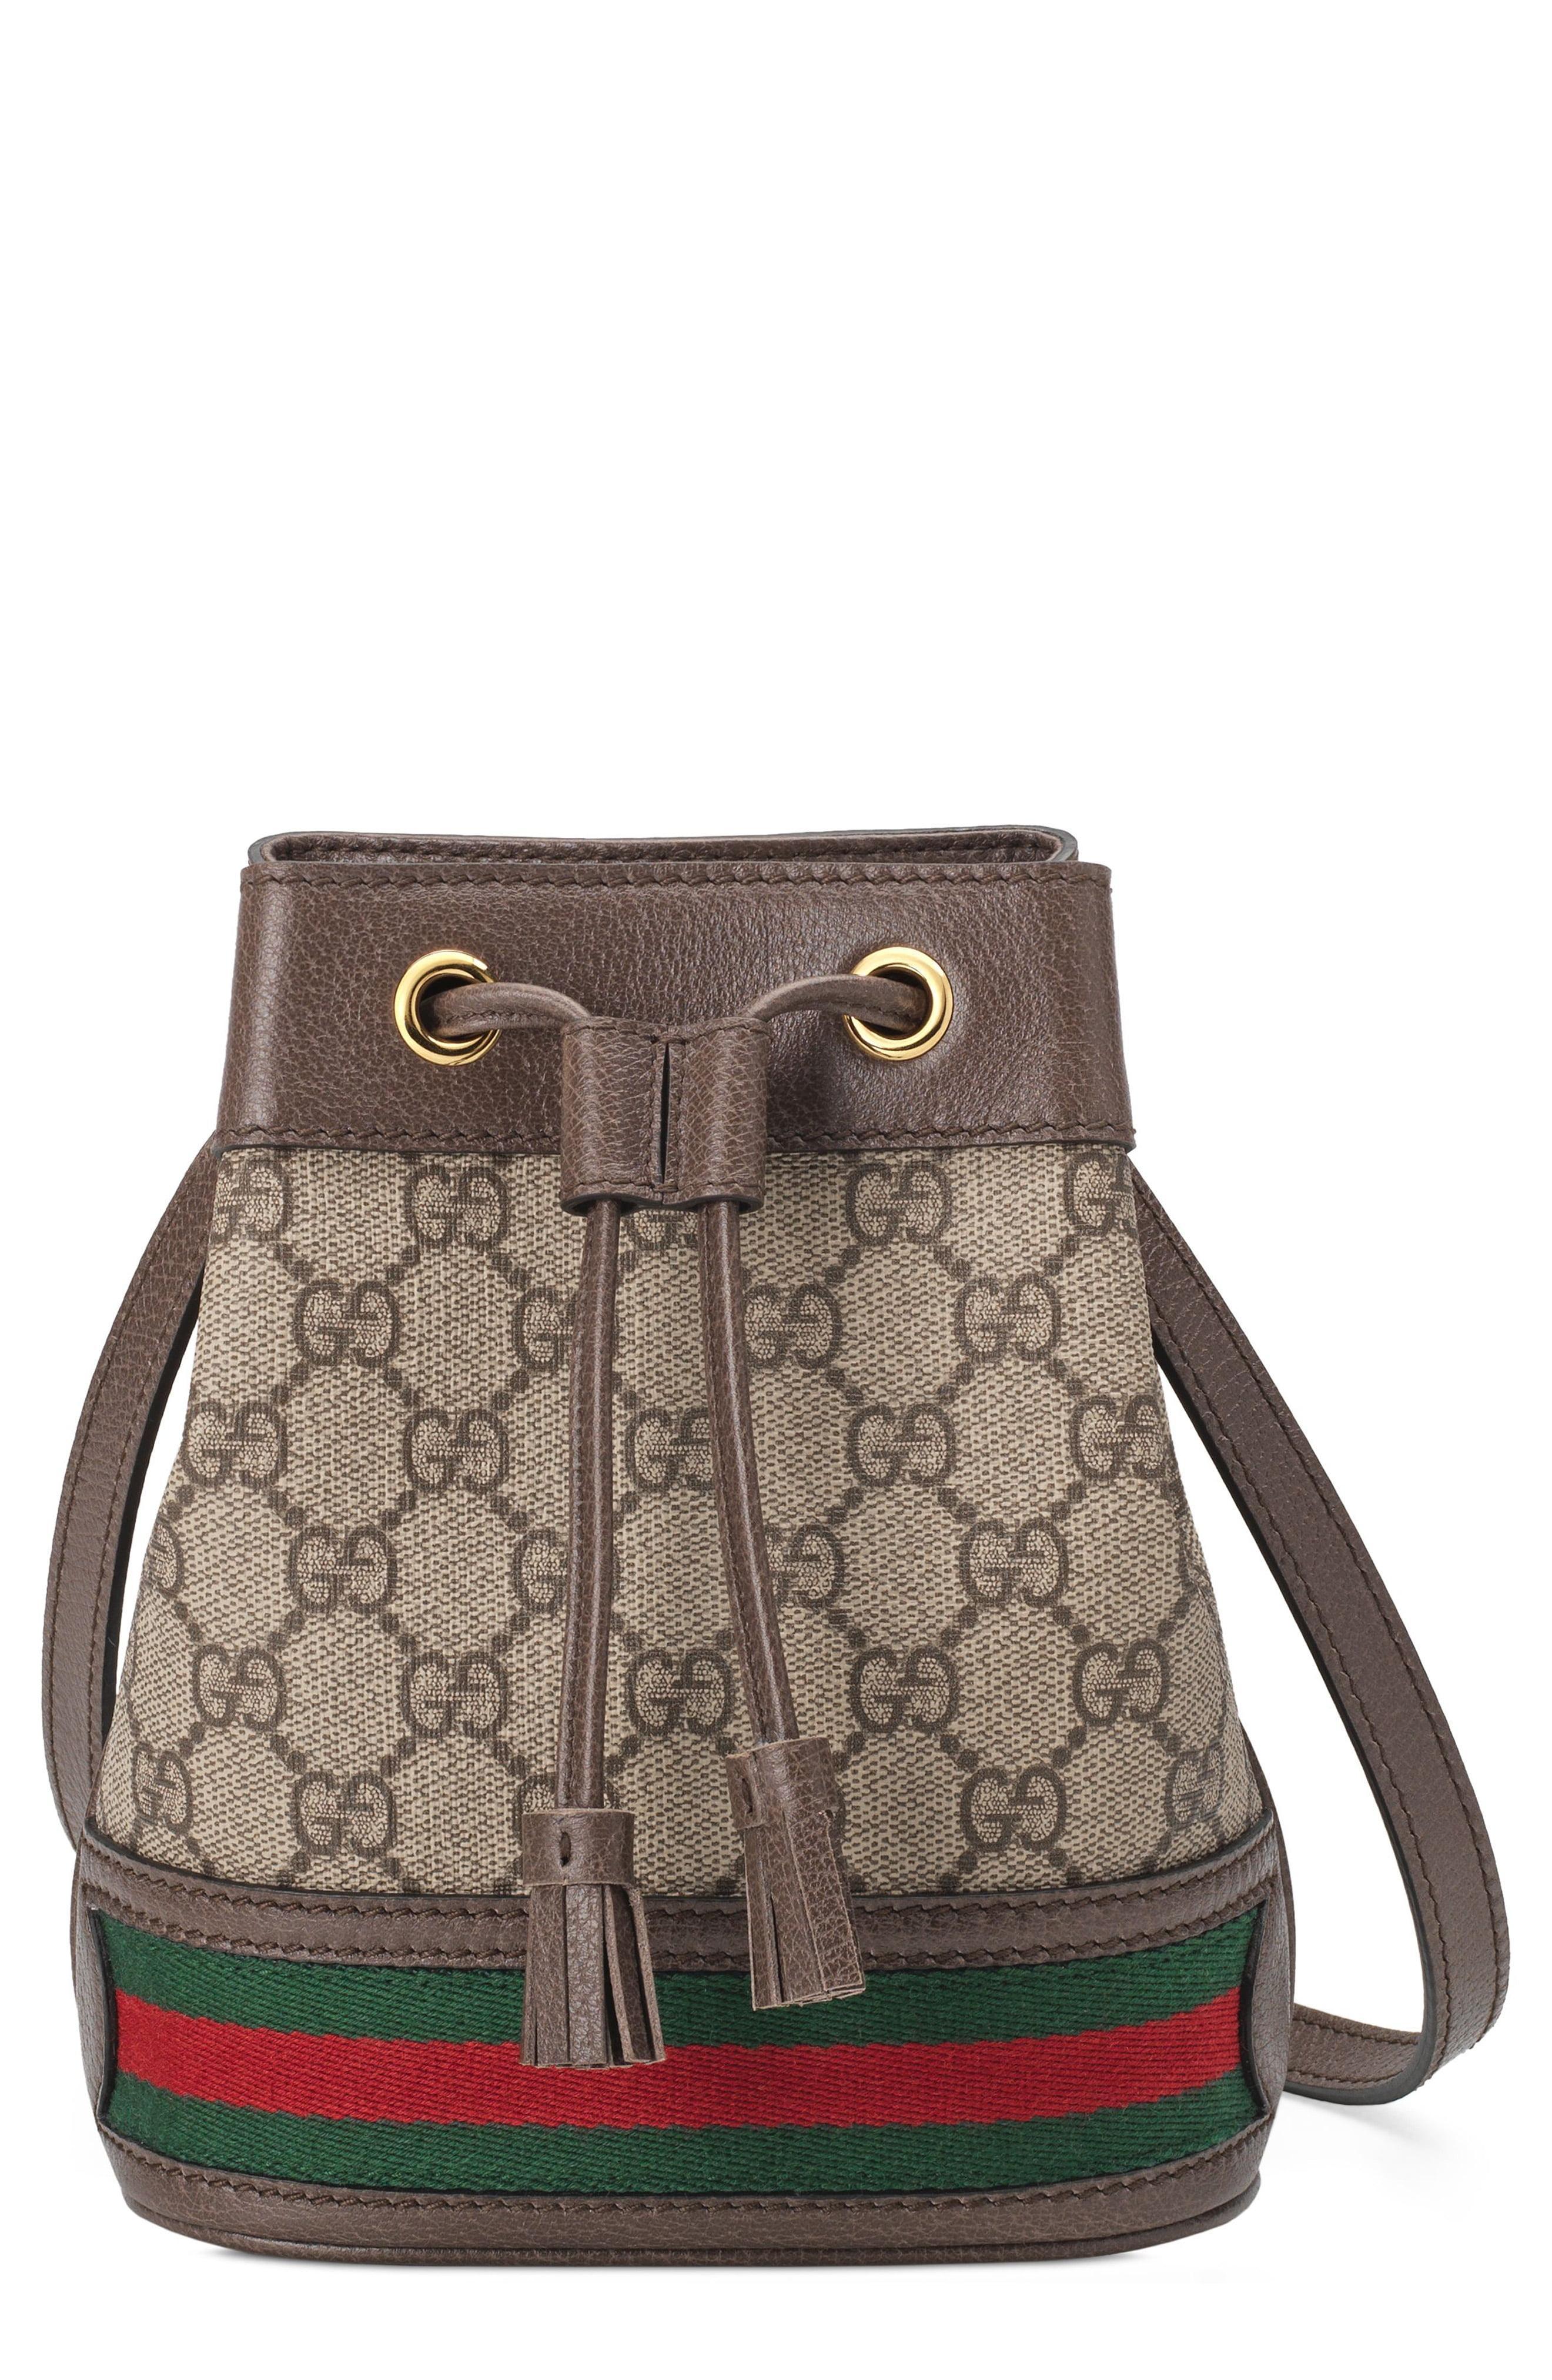 90cddfa66f8 Gucci. Women s Ophidia GG Mini Bucket Bag